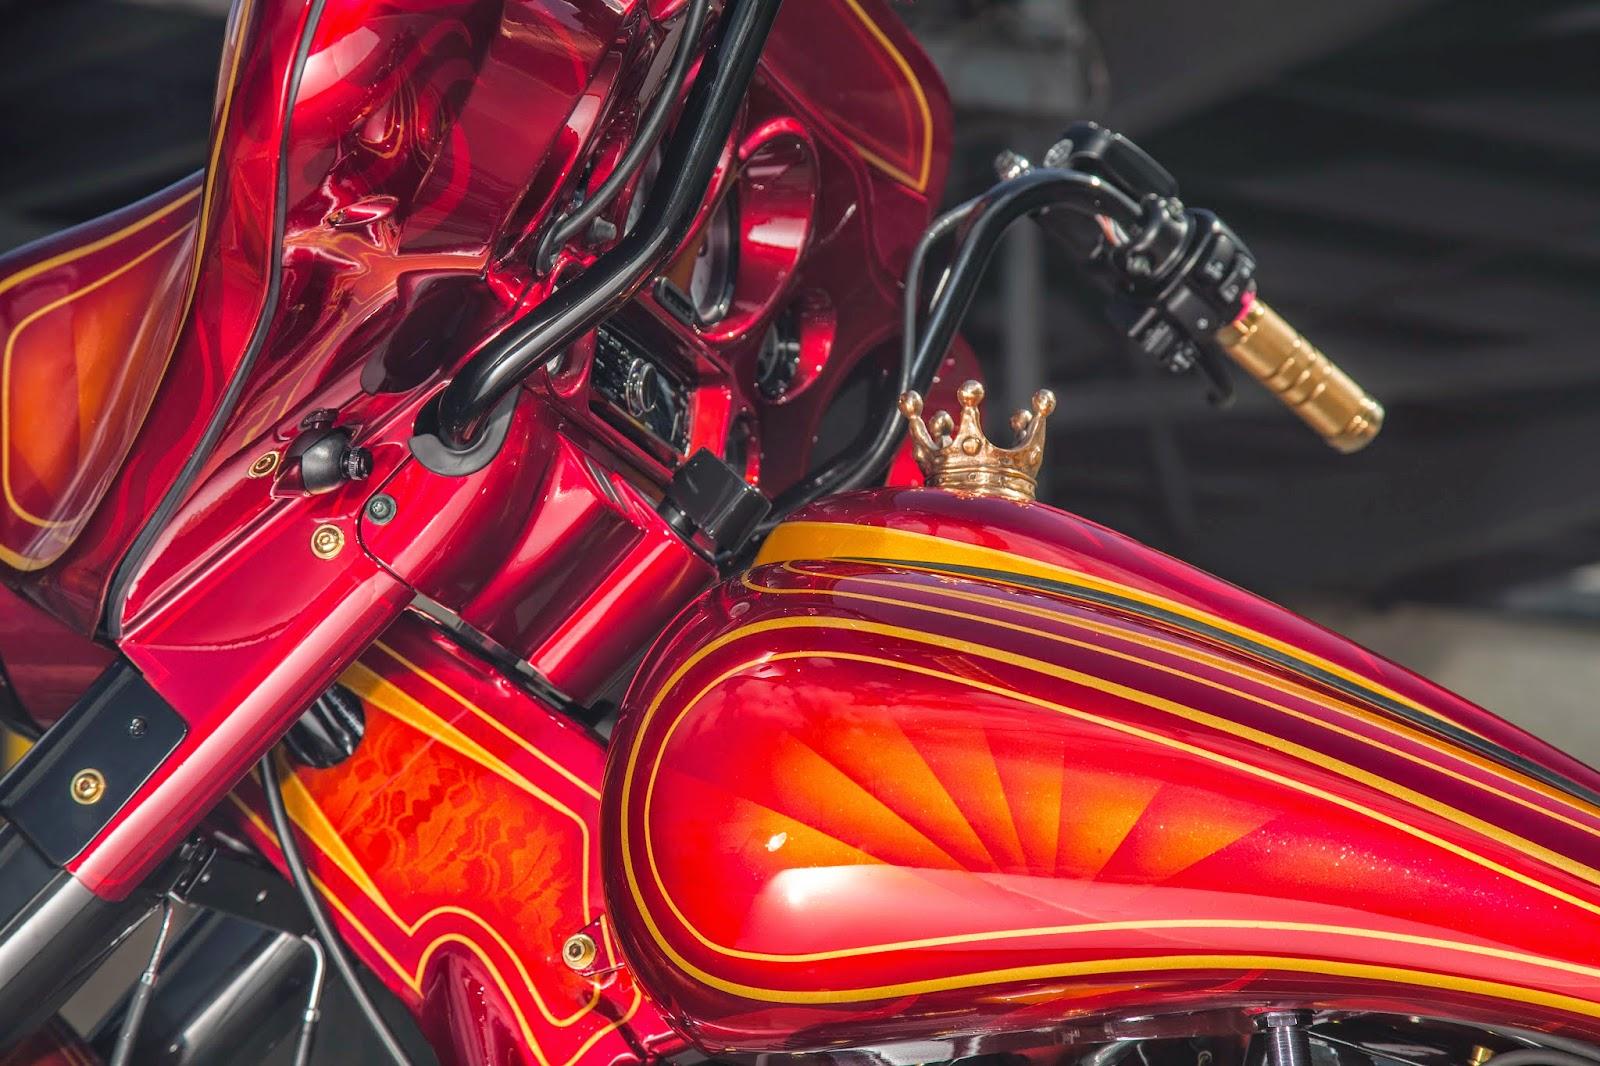 Brock Chobar - Long Beach Cycle Works - Custom Motorcycles and Hot Rods Brock Chobar Customs